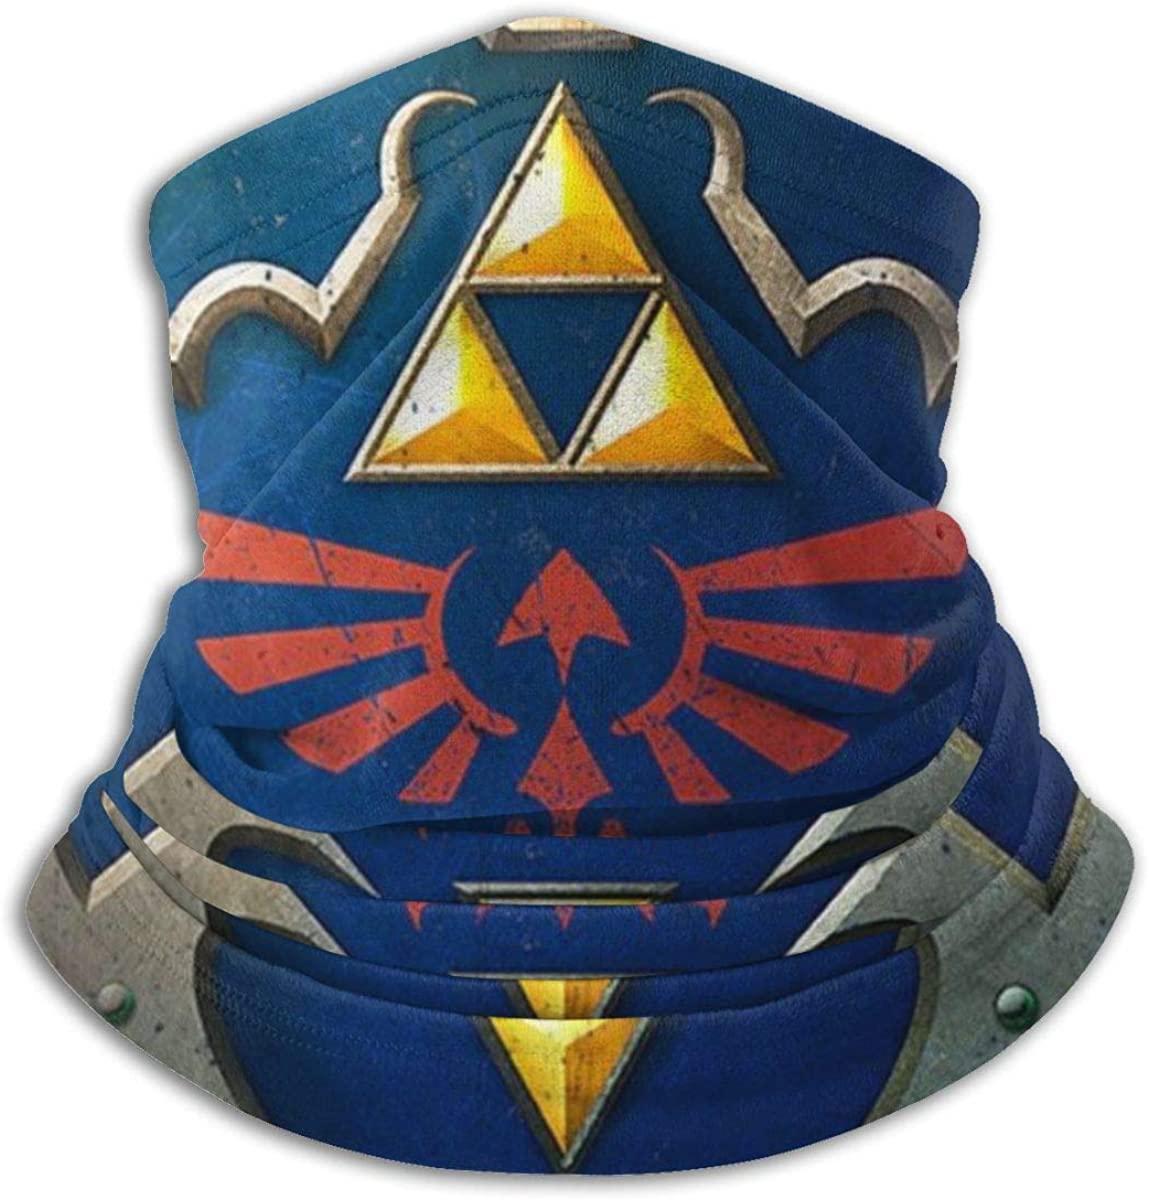 Hylian Shield Legend Of Zelda Triforce Face Mask Bandanas For Dust, Outdoors, Festivals, Sports